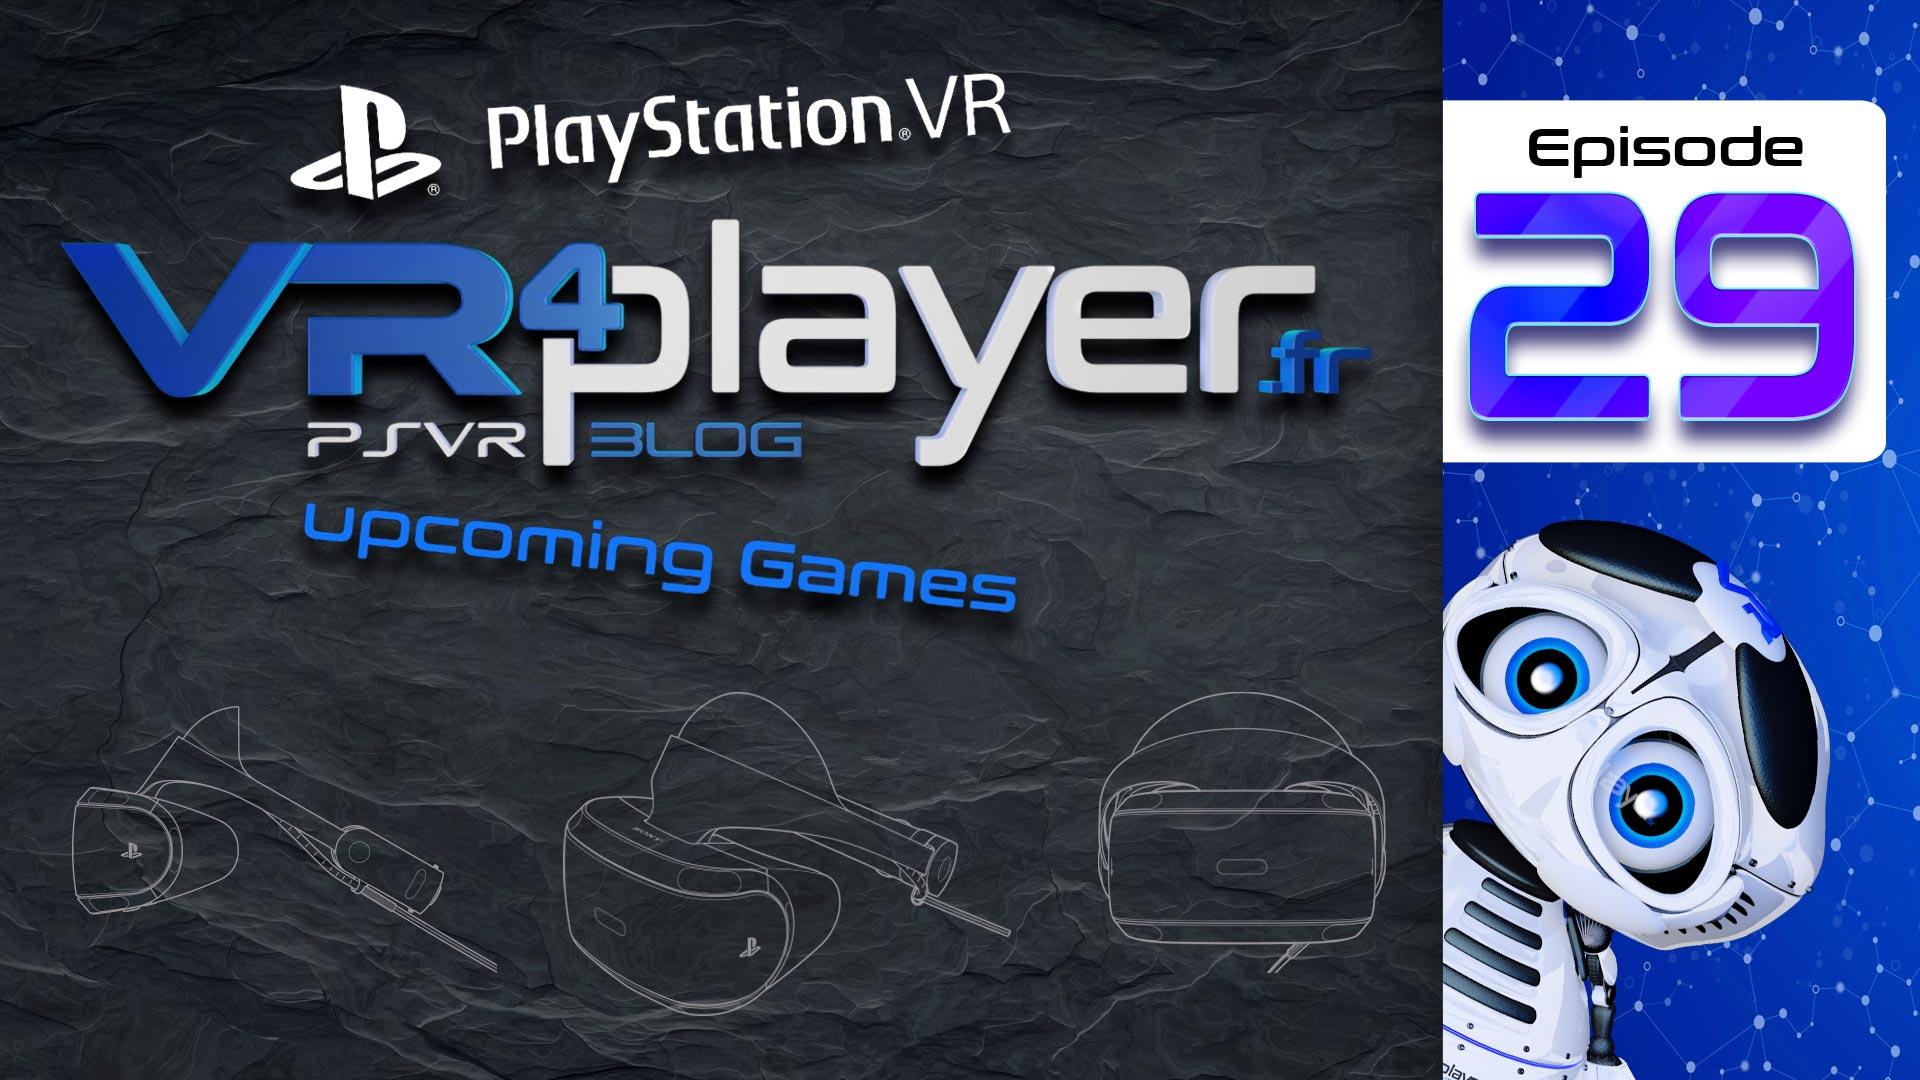 PlayStation VR - Upcoming games Episode 29